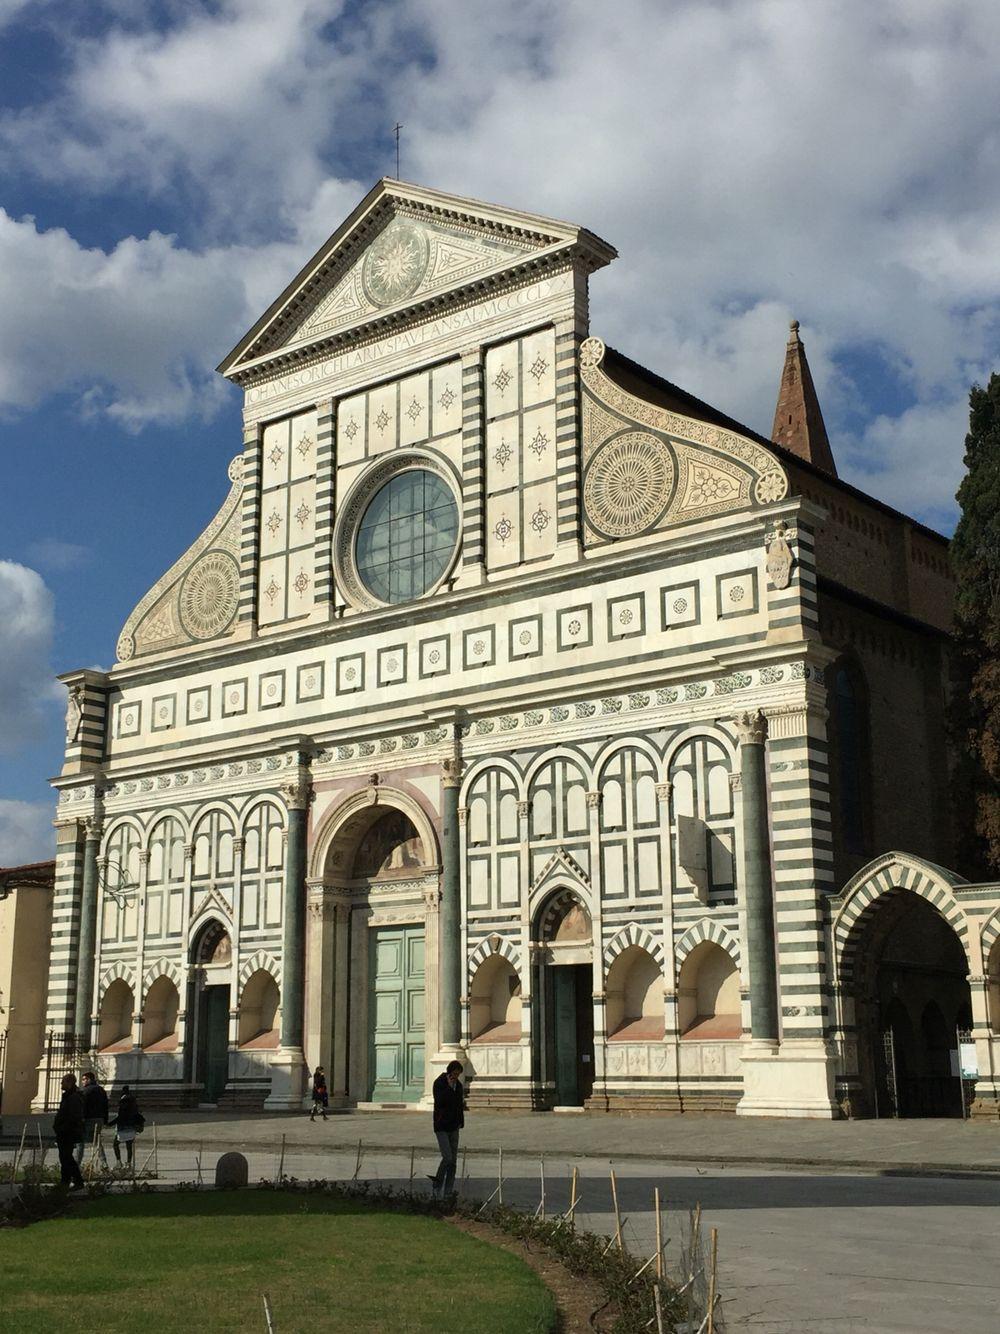 Igreja de Santa Maria Novella, Florença, Itália. (março/2016).